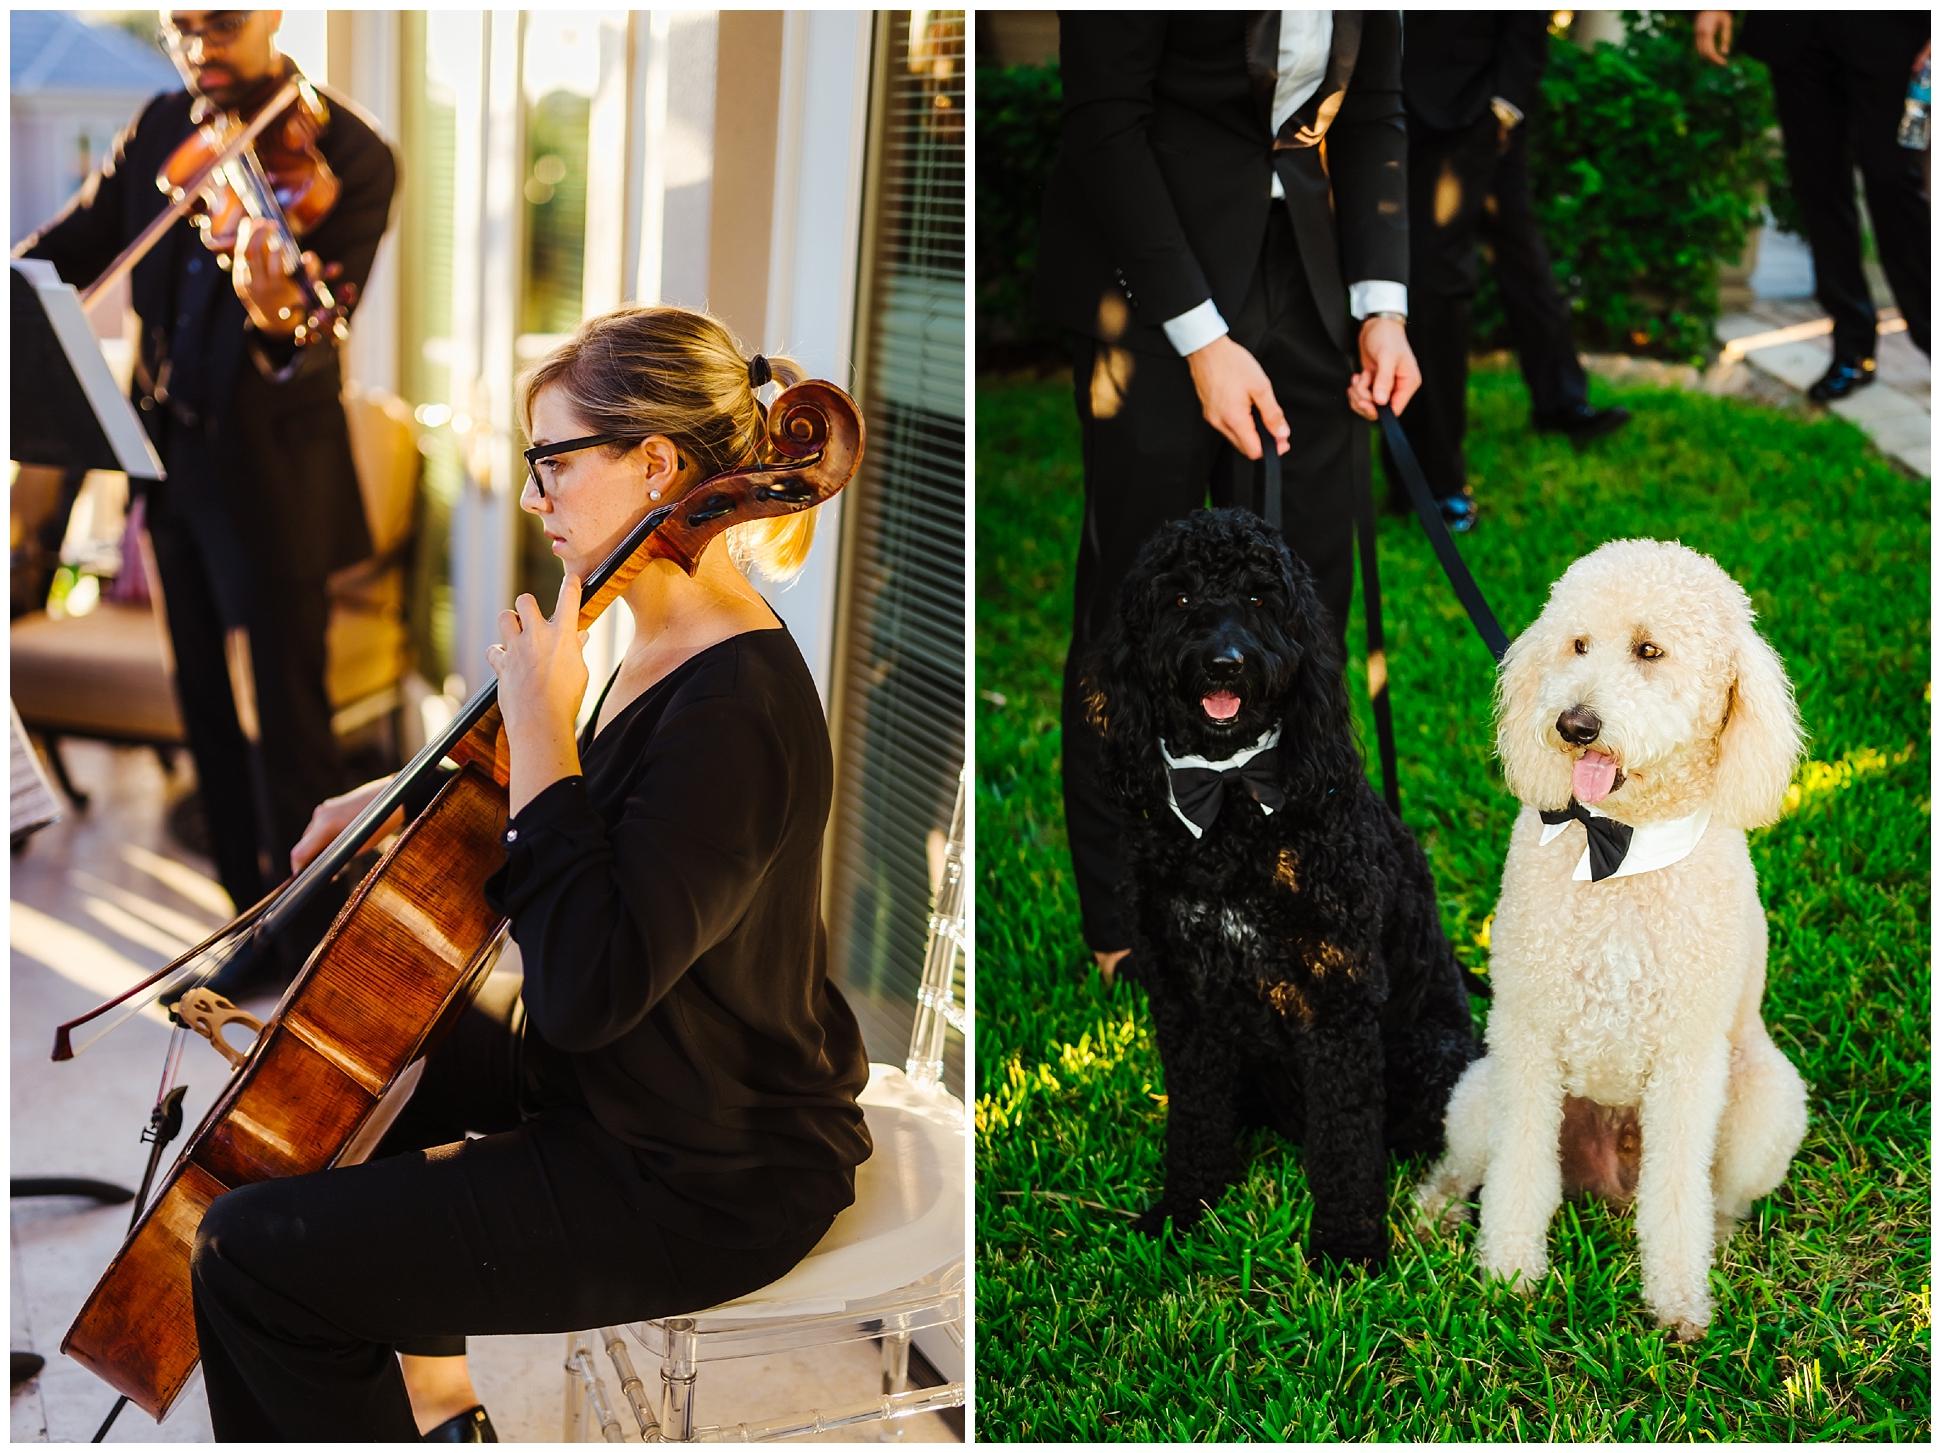 st-pete-wedding-photographer-backyard-luxury-snell-isle-vinoy_0032.jpg